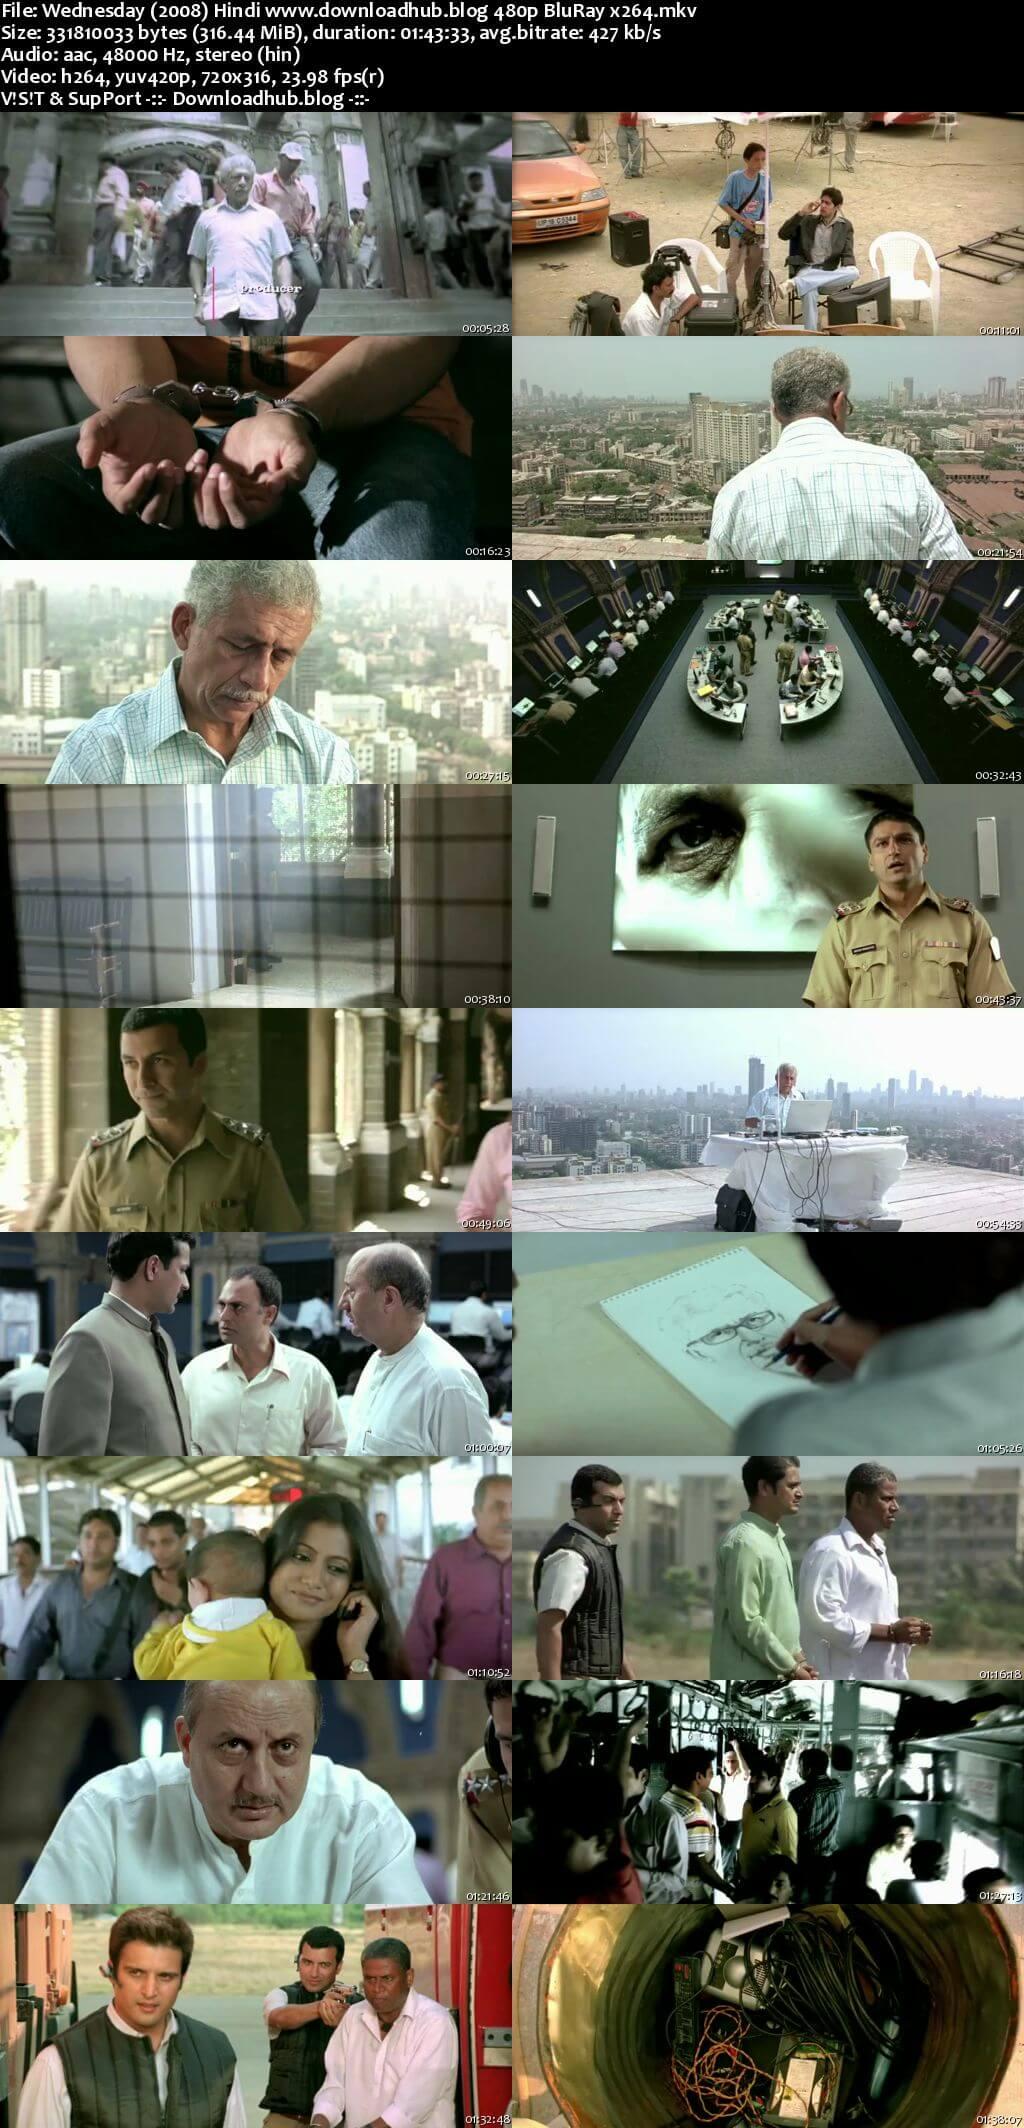 A Wednesday 2008 Hindi 300MB BluRay 480p